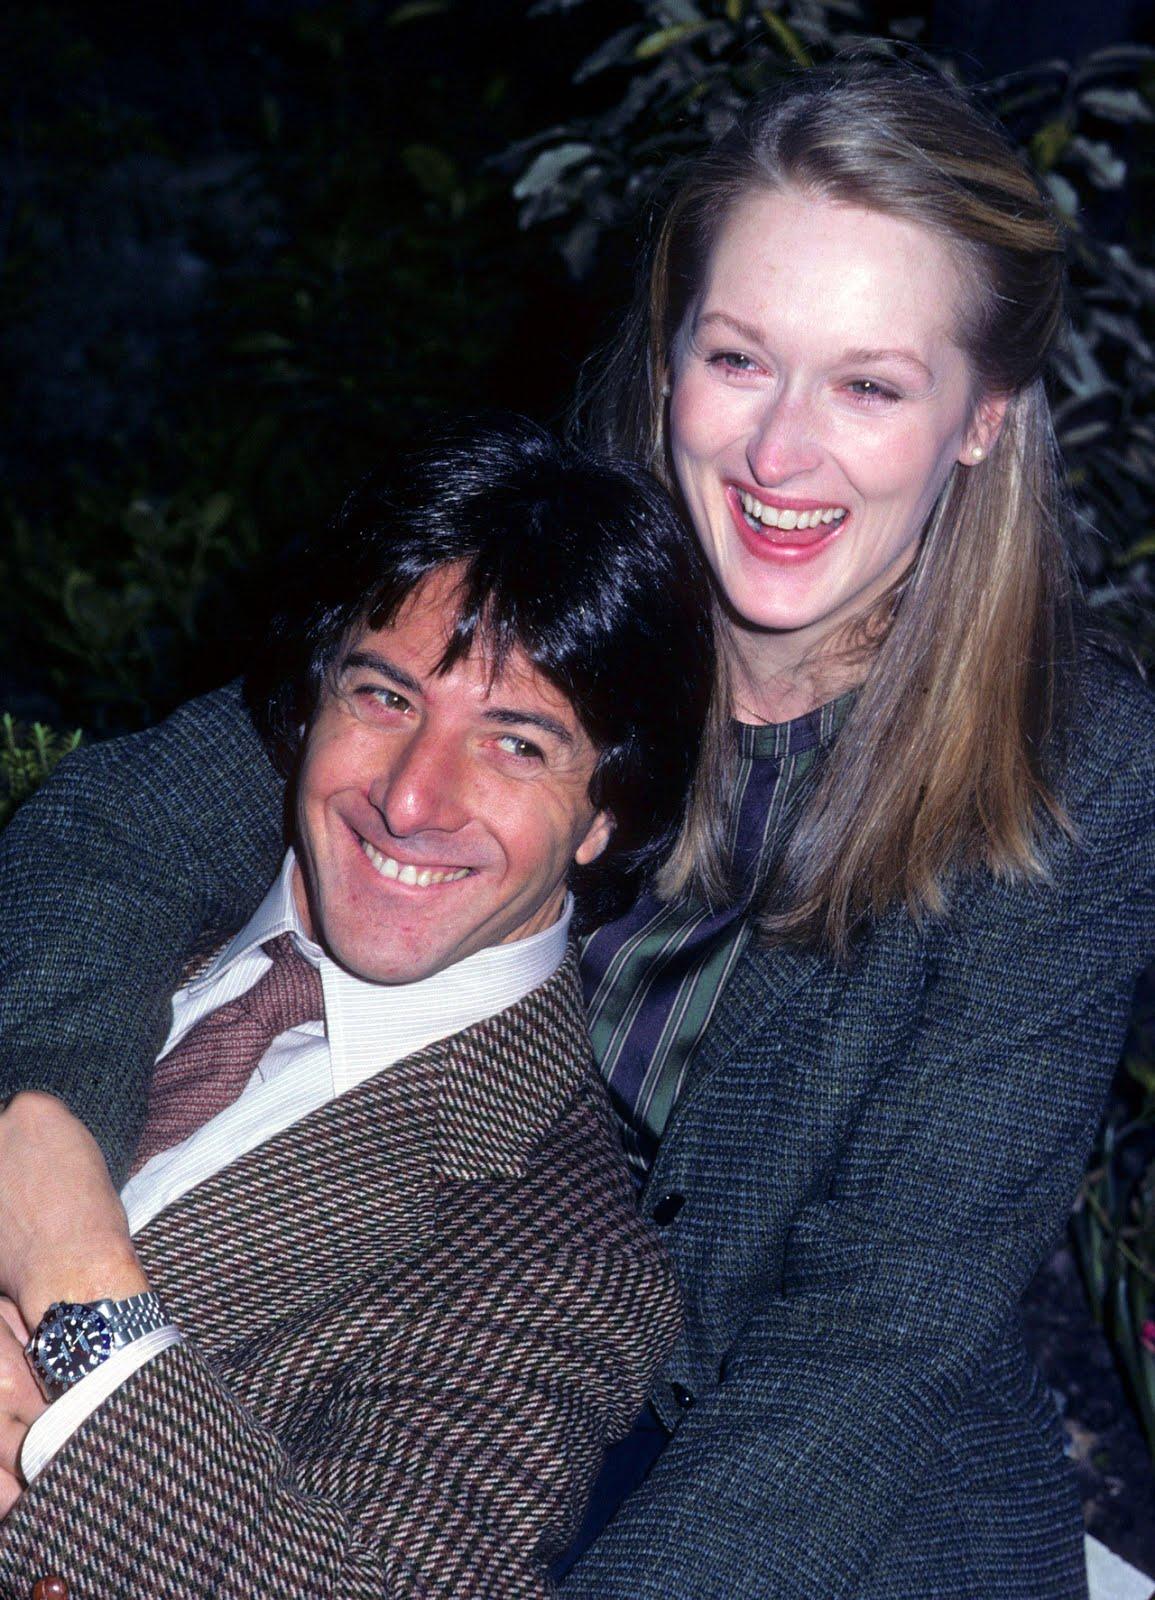 http://1.bp.blogspot.com/-5ugfPSVcg6M/UJuFo0ogM-I/AAAAAAAASzY/psaBy86jaqQ/s1600/Dustin-Hoffman-with-Meryl-Streep-Kramer-v-Kramer-Rolex-GMT.jpg